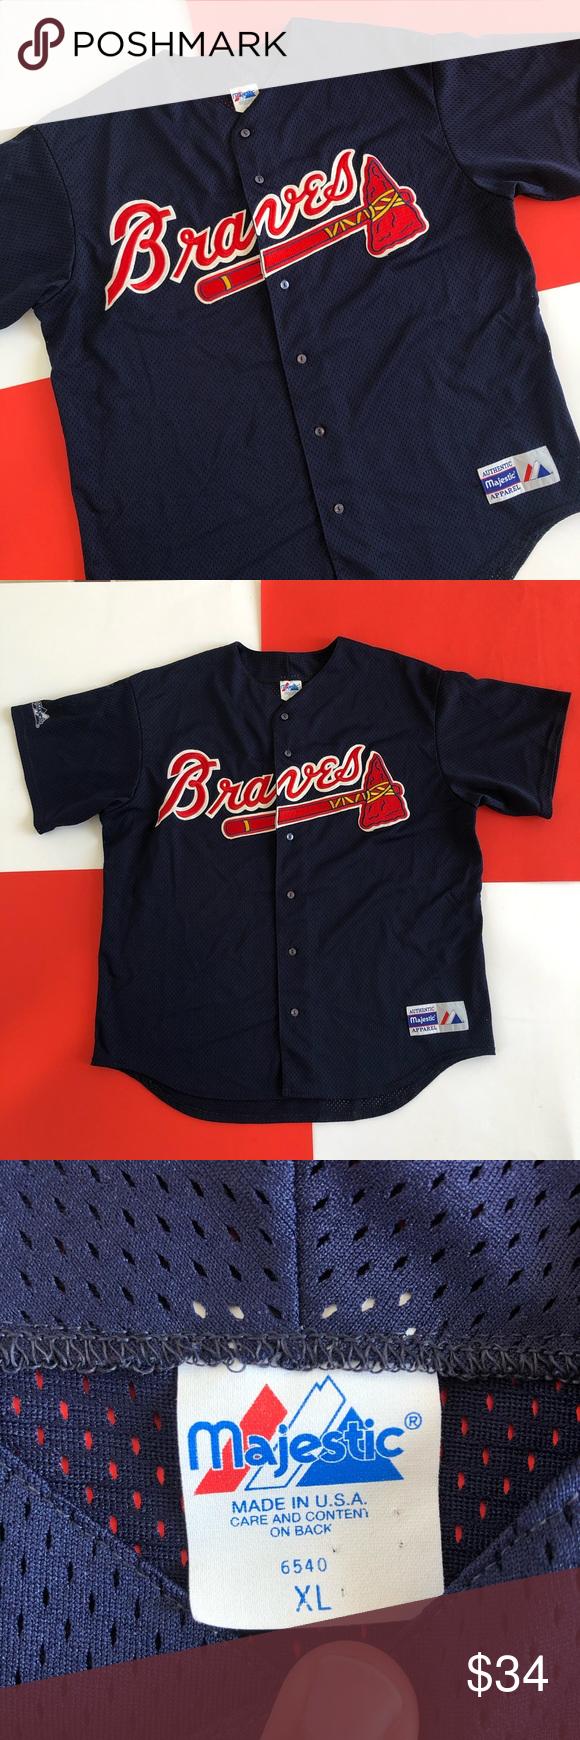 Vintage Majestic Atlanta Braves Baseball Jersey In 2020 Atlanta Braves Baseball Atlanta Braves Braves